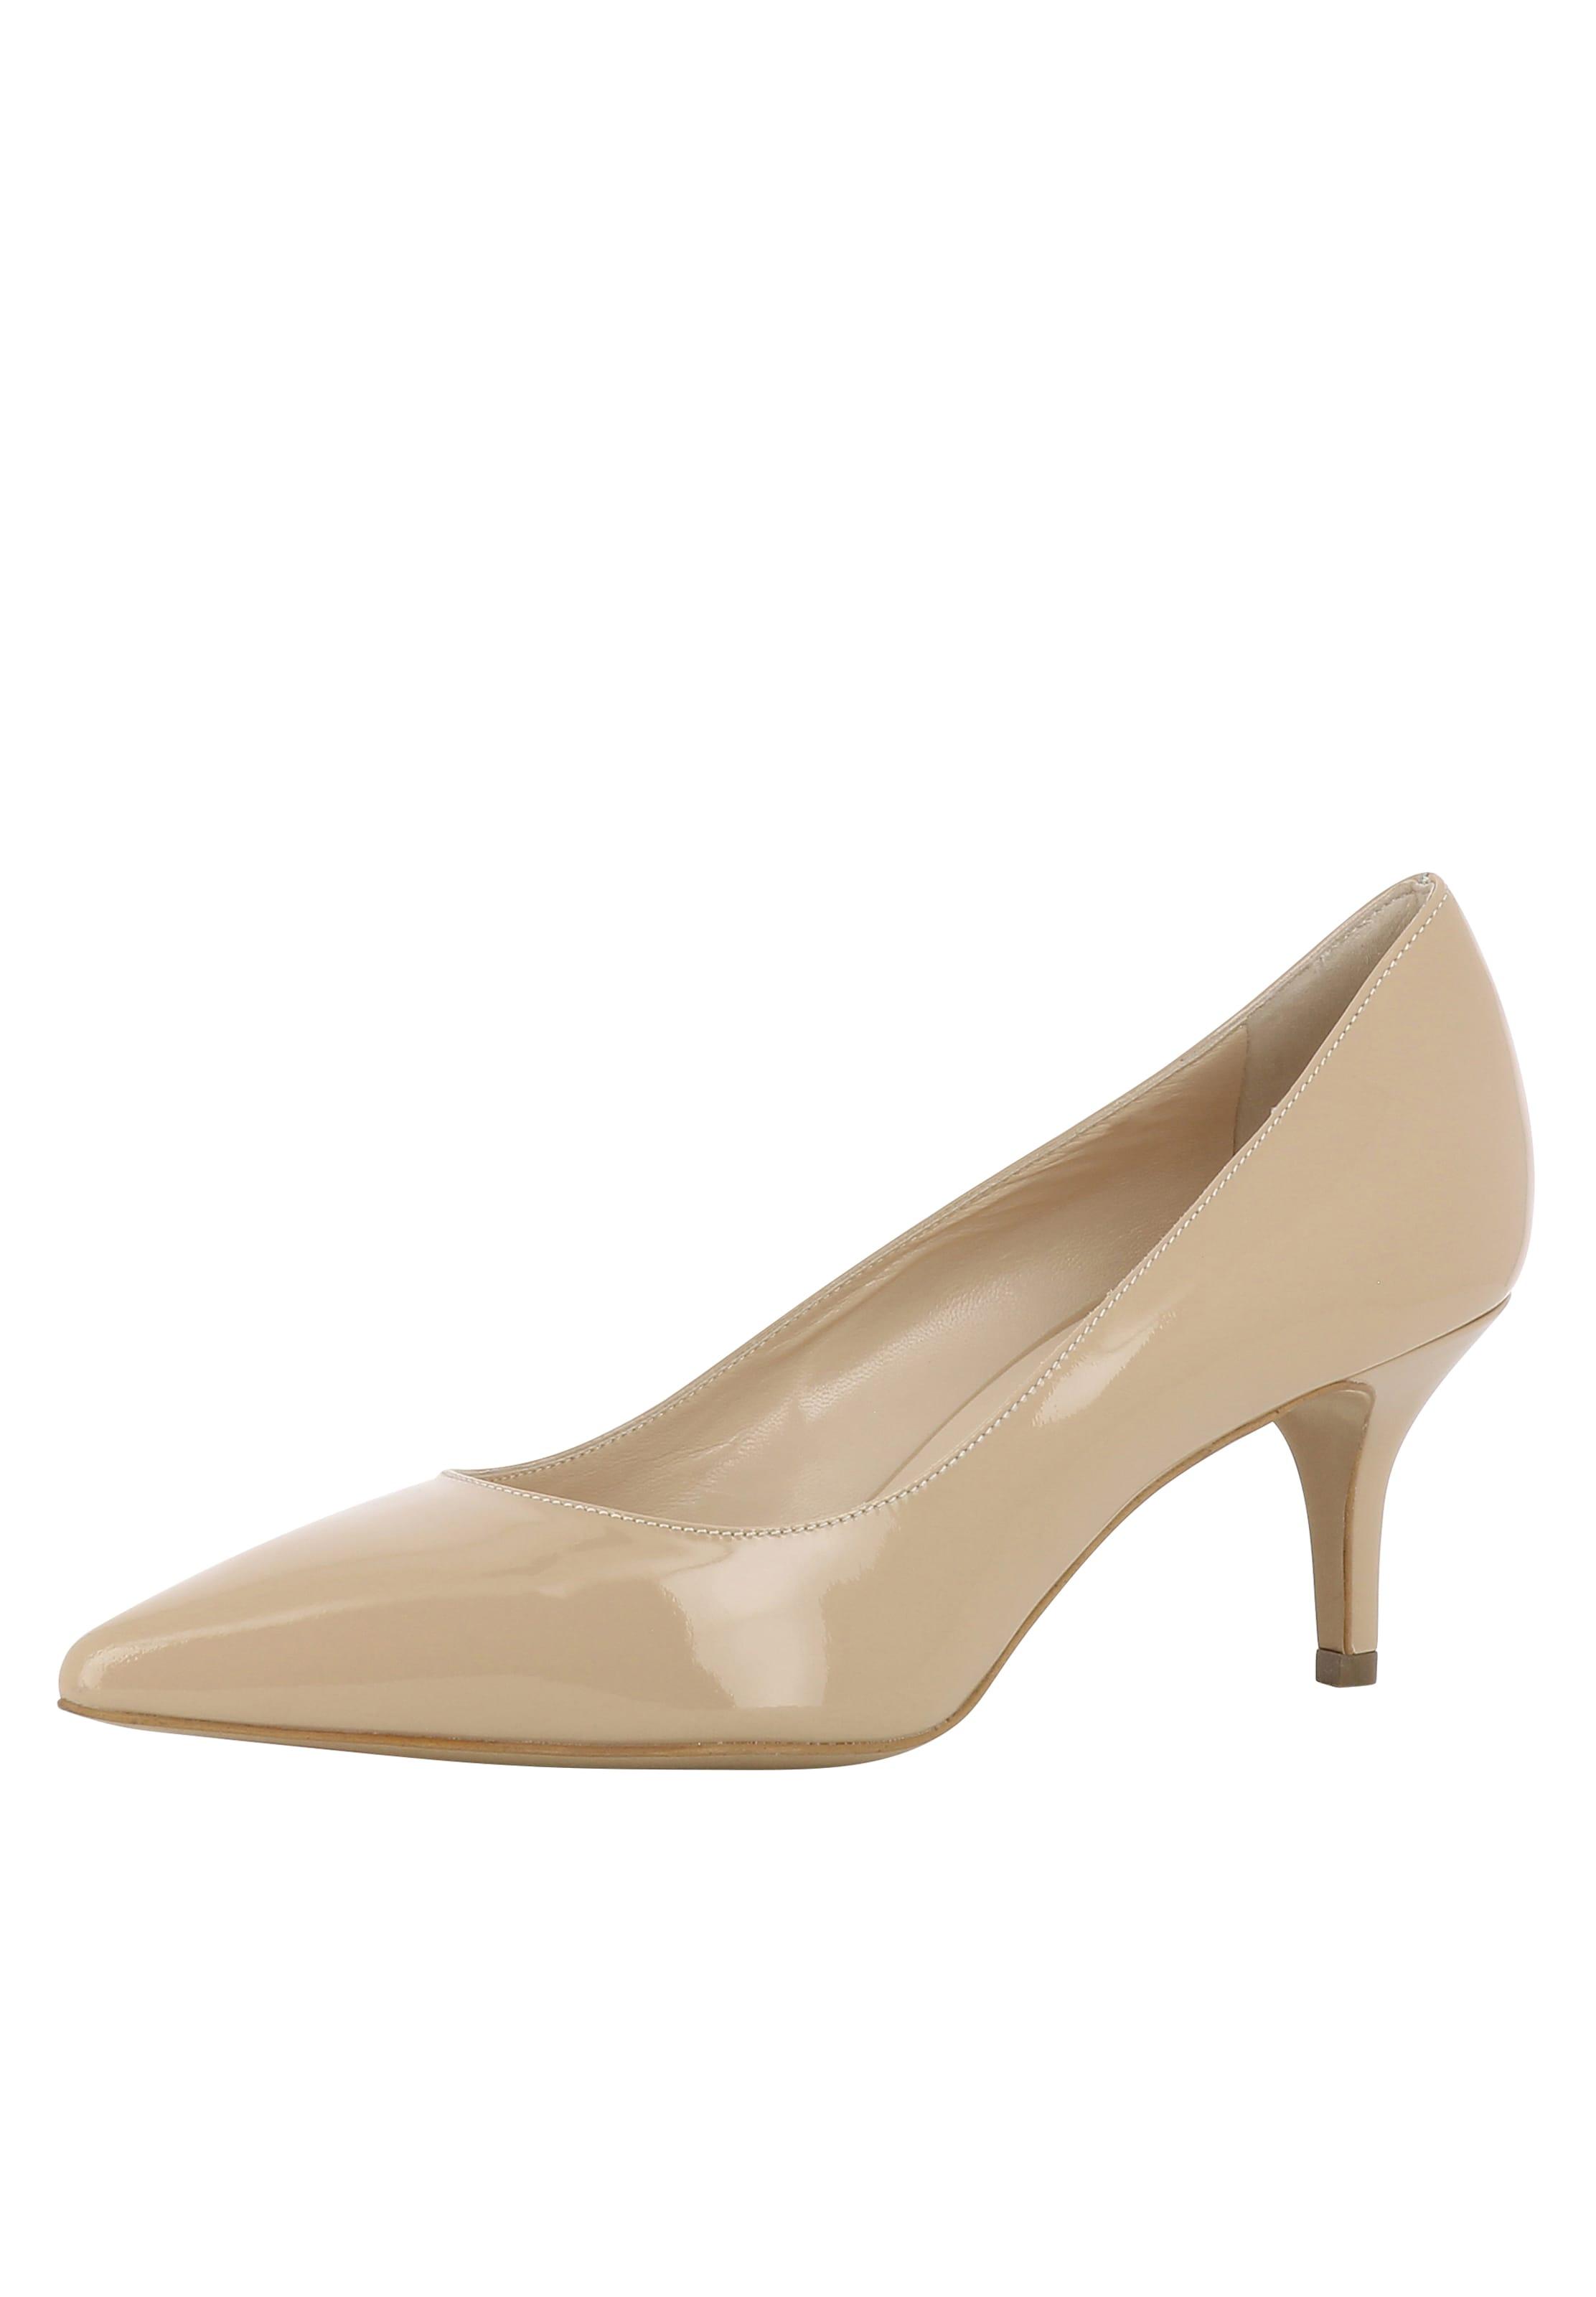 Haltbare Mode billige Schuhe EVITA | Pumps 'GIULIA' Schuhe Gut getragene Schuhe